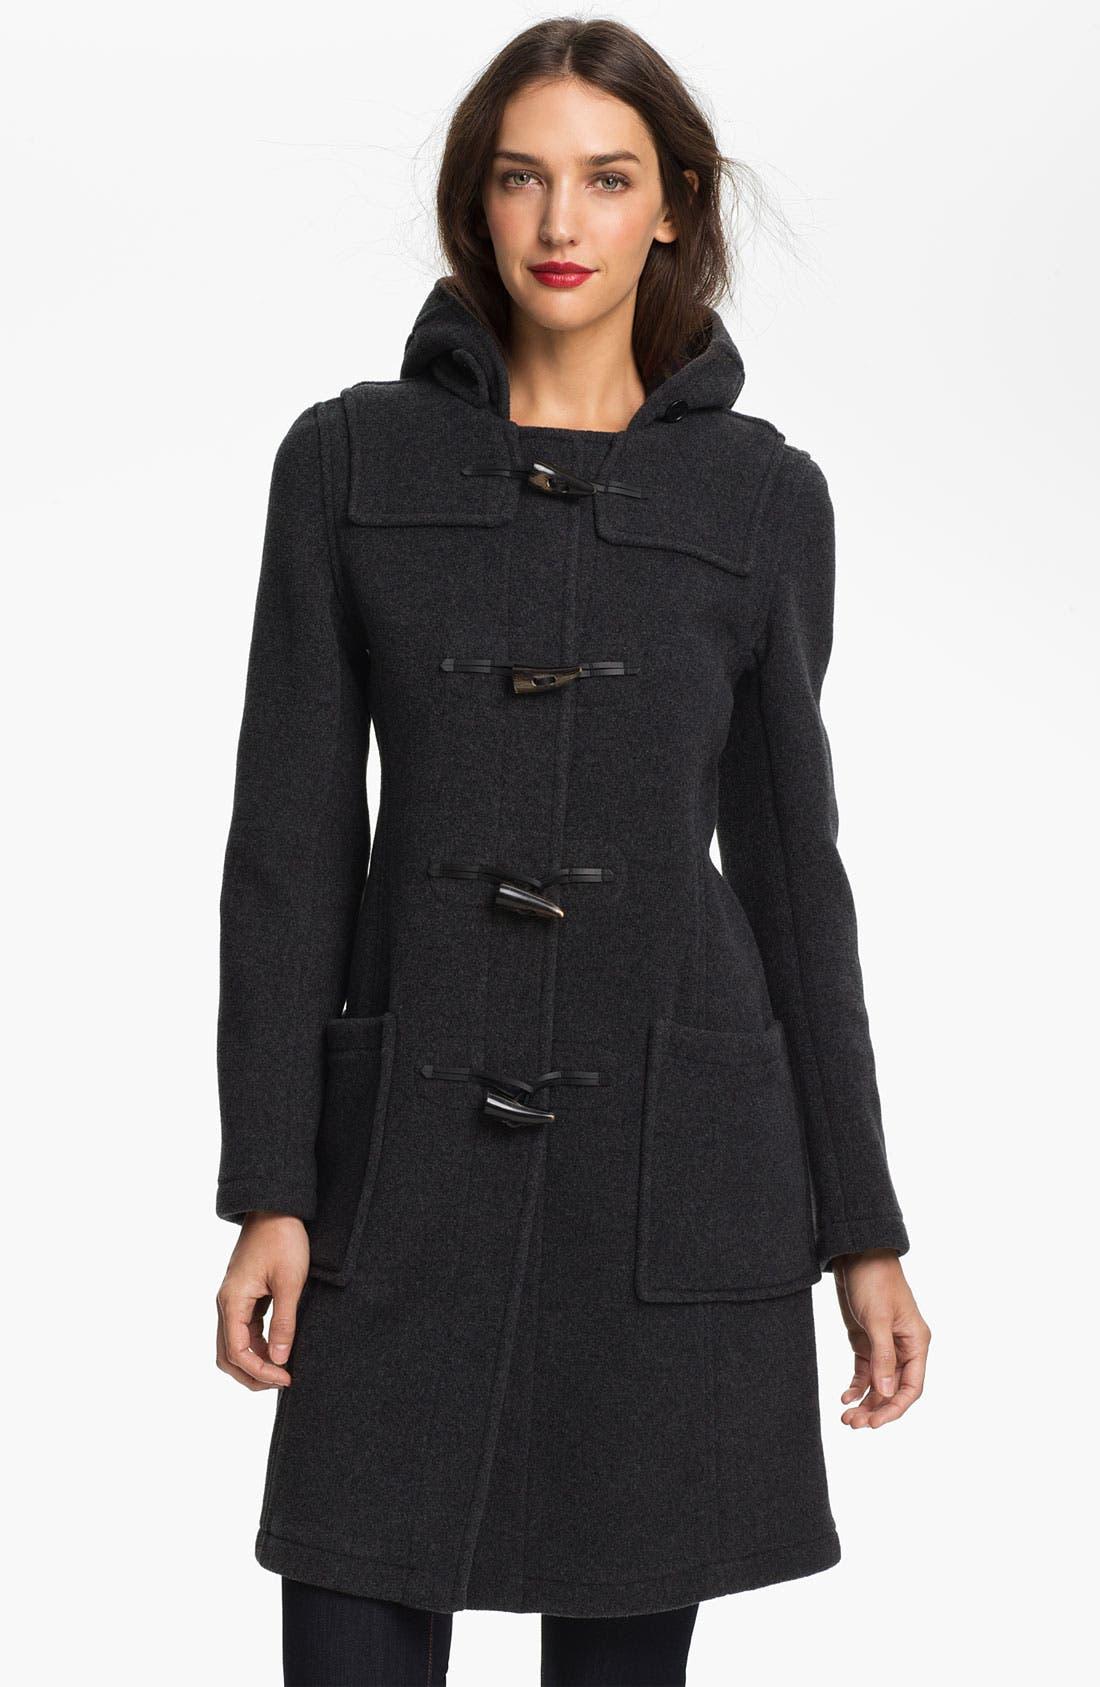 Alternate Image 1 Selected - Gloverall Slim Fit Duffle Coat